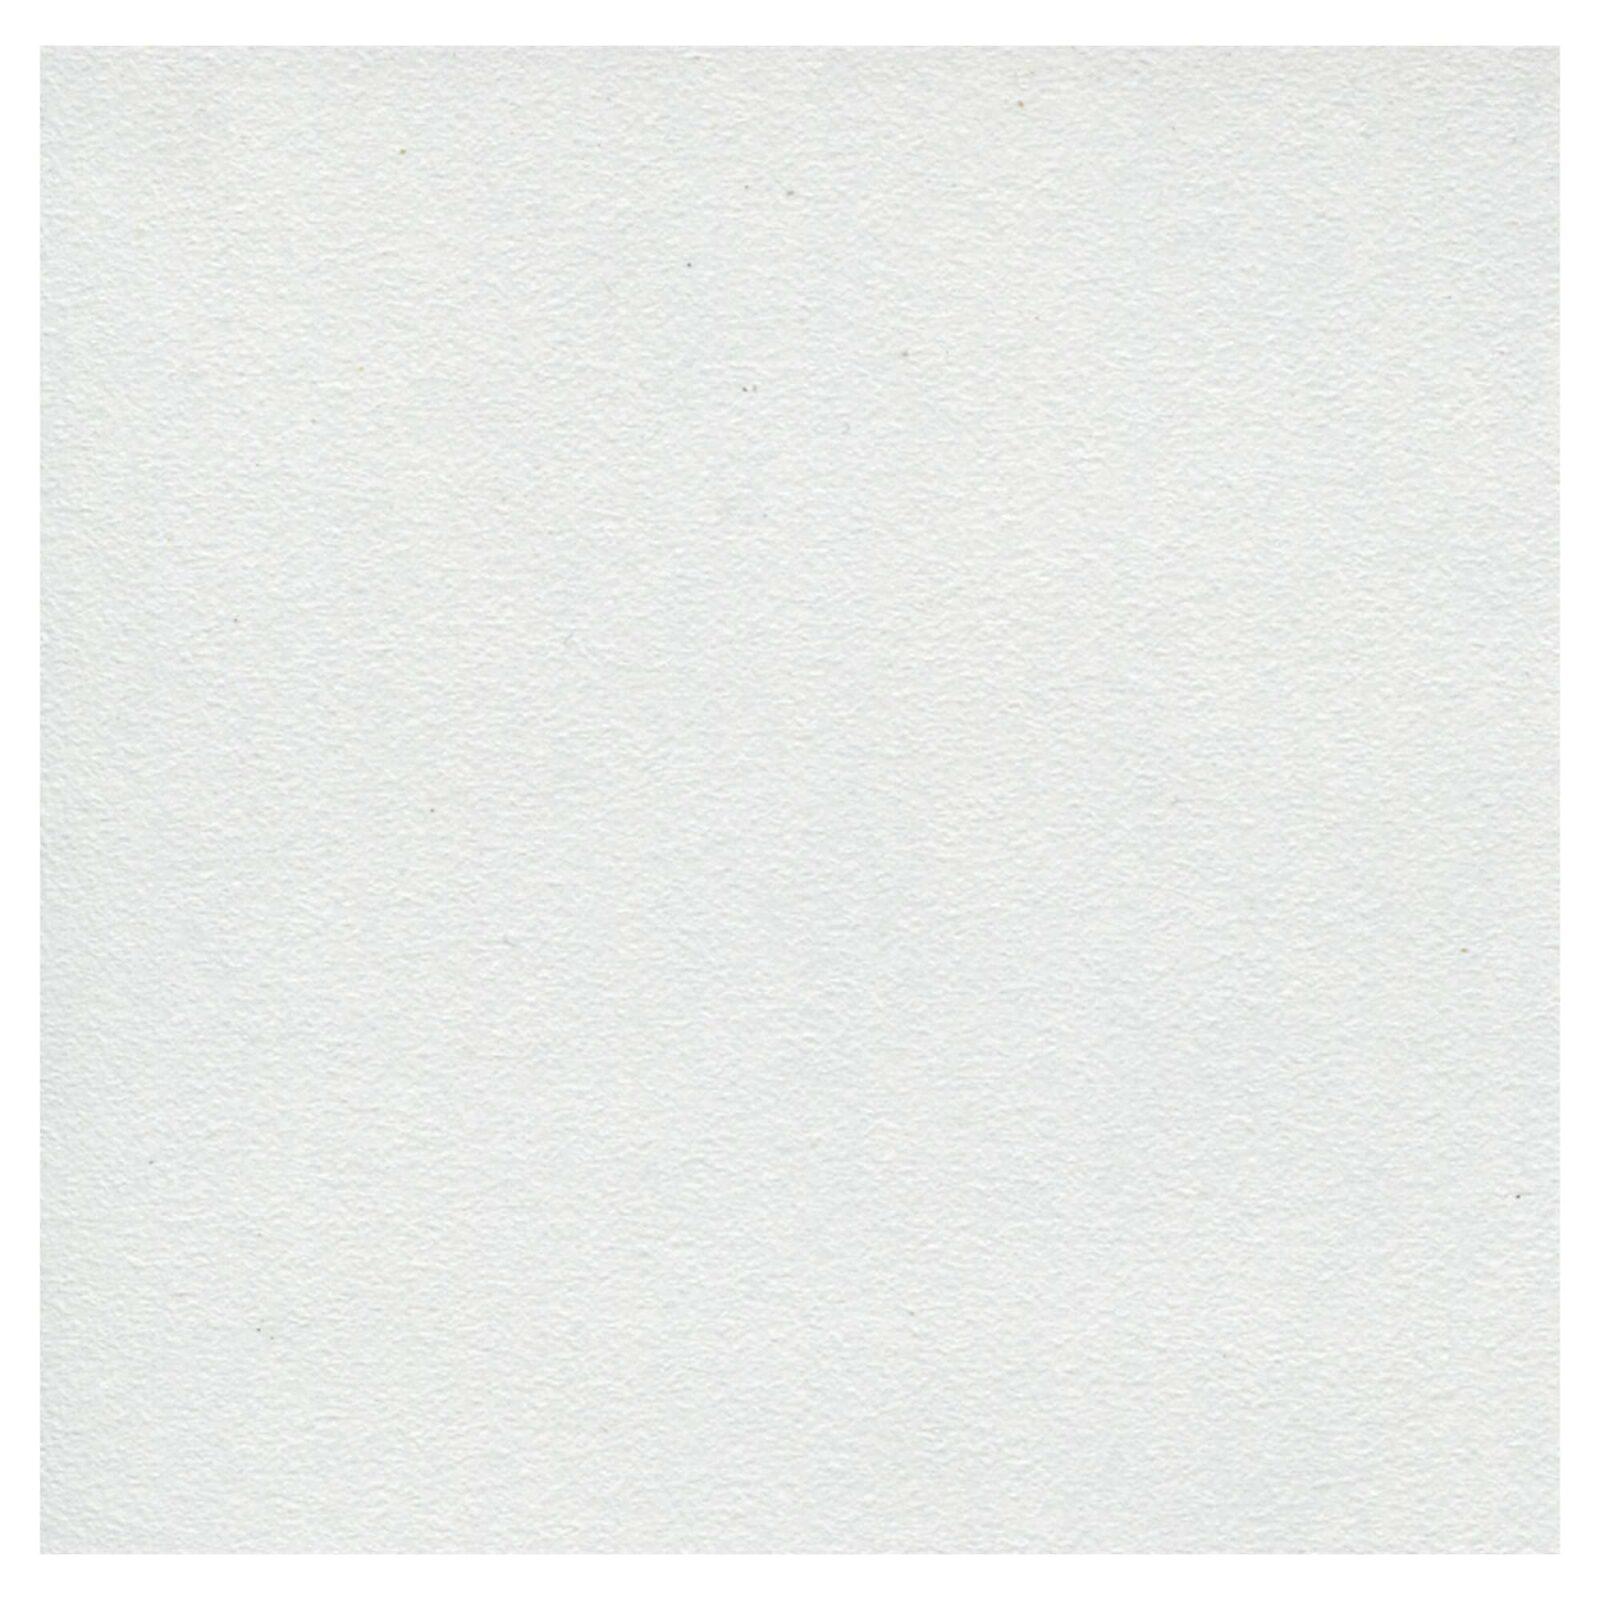 Мебельный щит 6х600х3000 (№10) БЕЛЫЙ